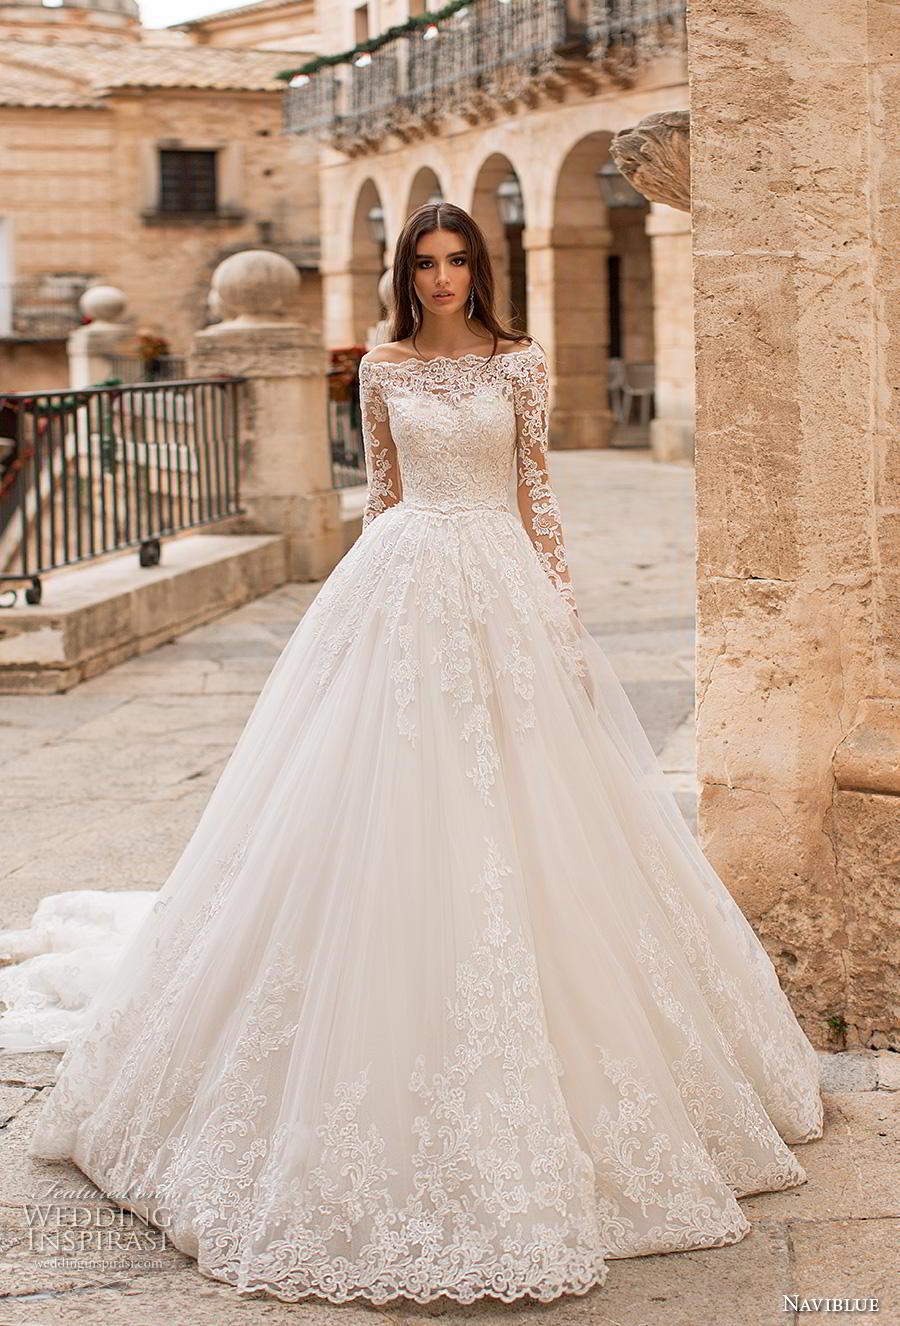 naviblue 2019 bridal long sleeves off the shoulder becjlie heavily embellished bodice hem princess ball gown a line wedding dress lace back royal train (12) mv